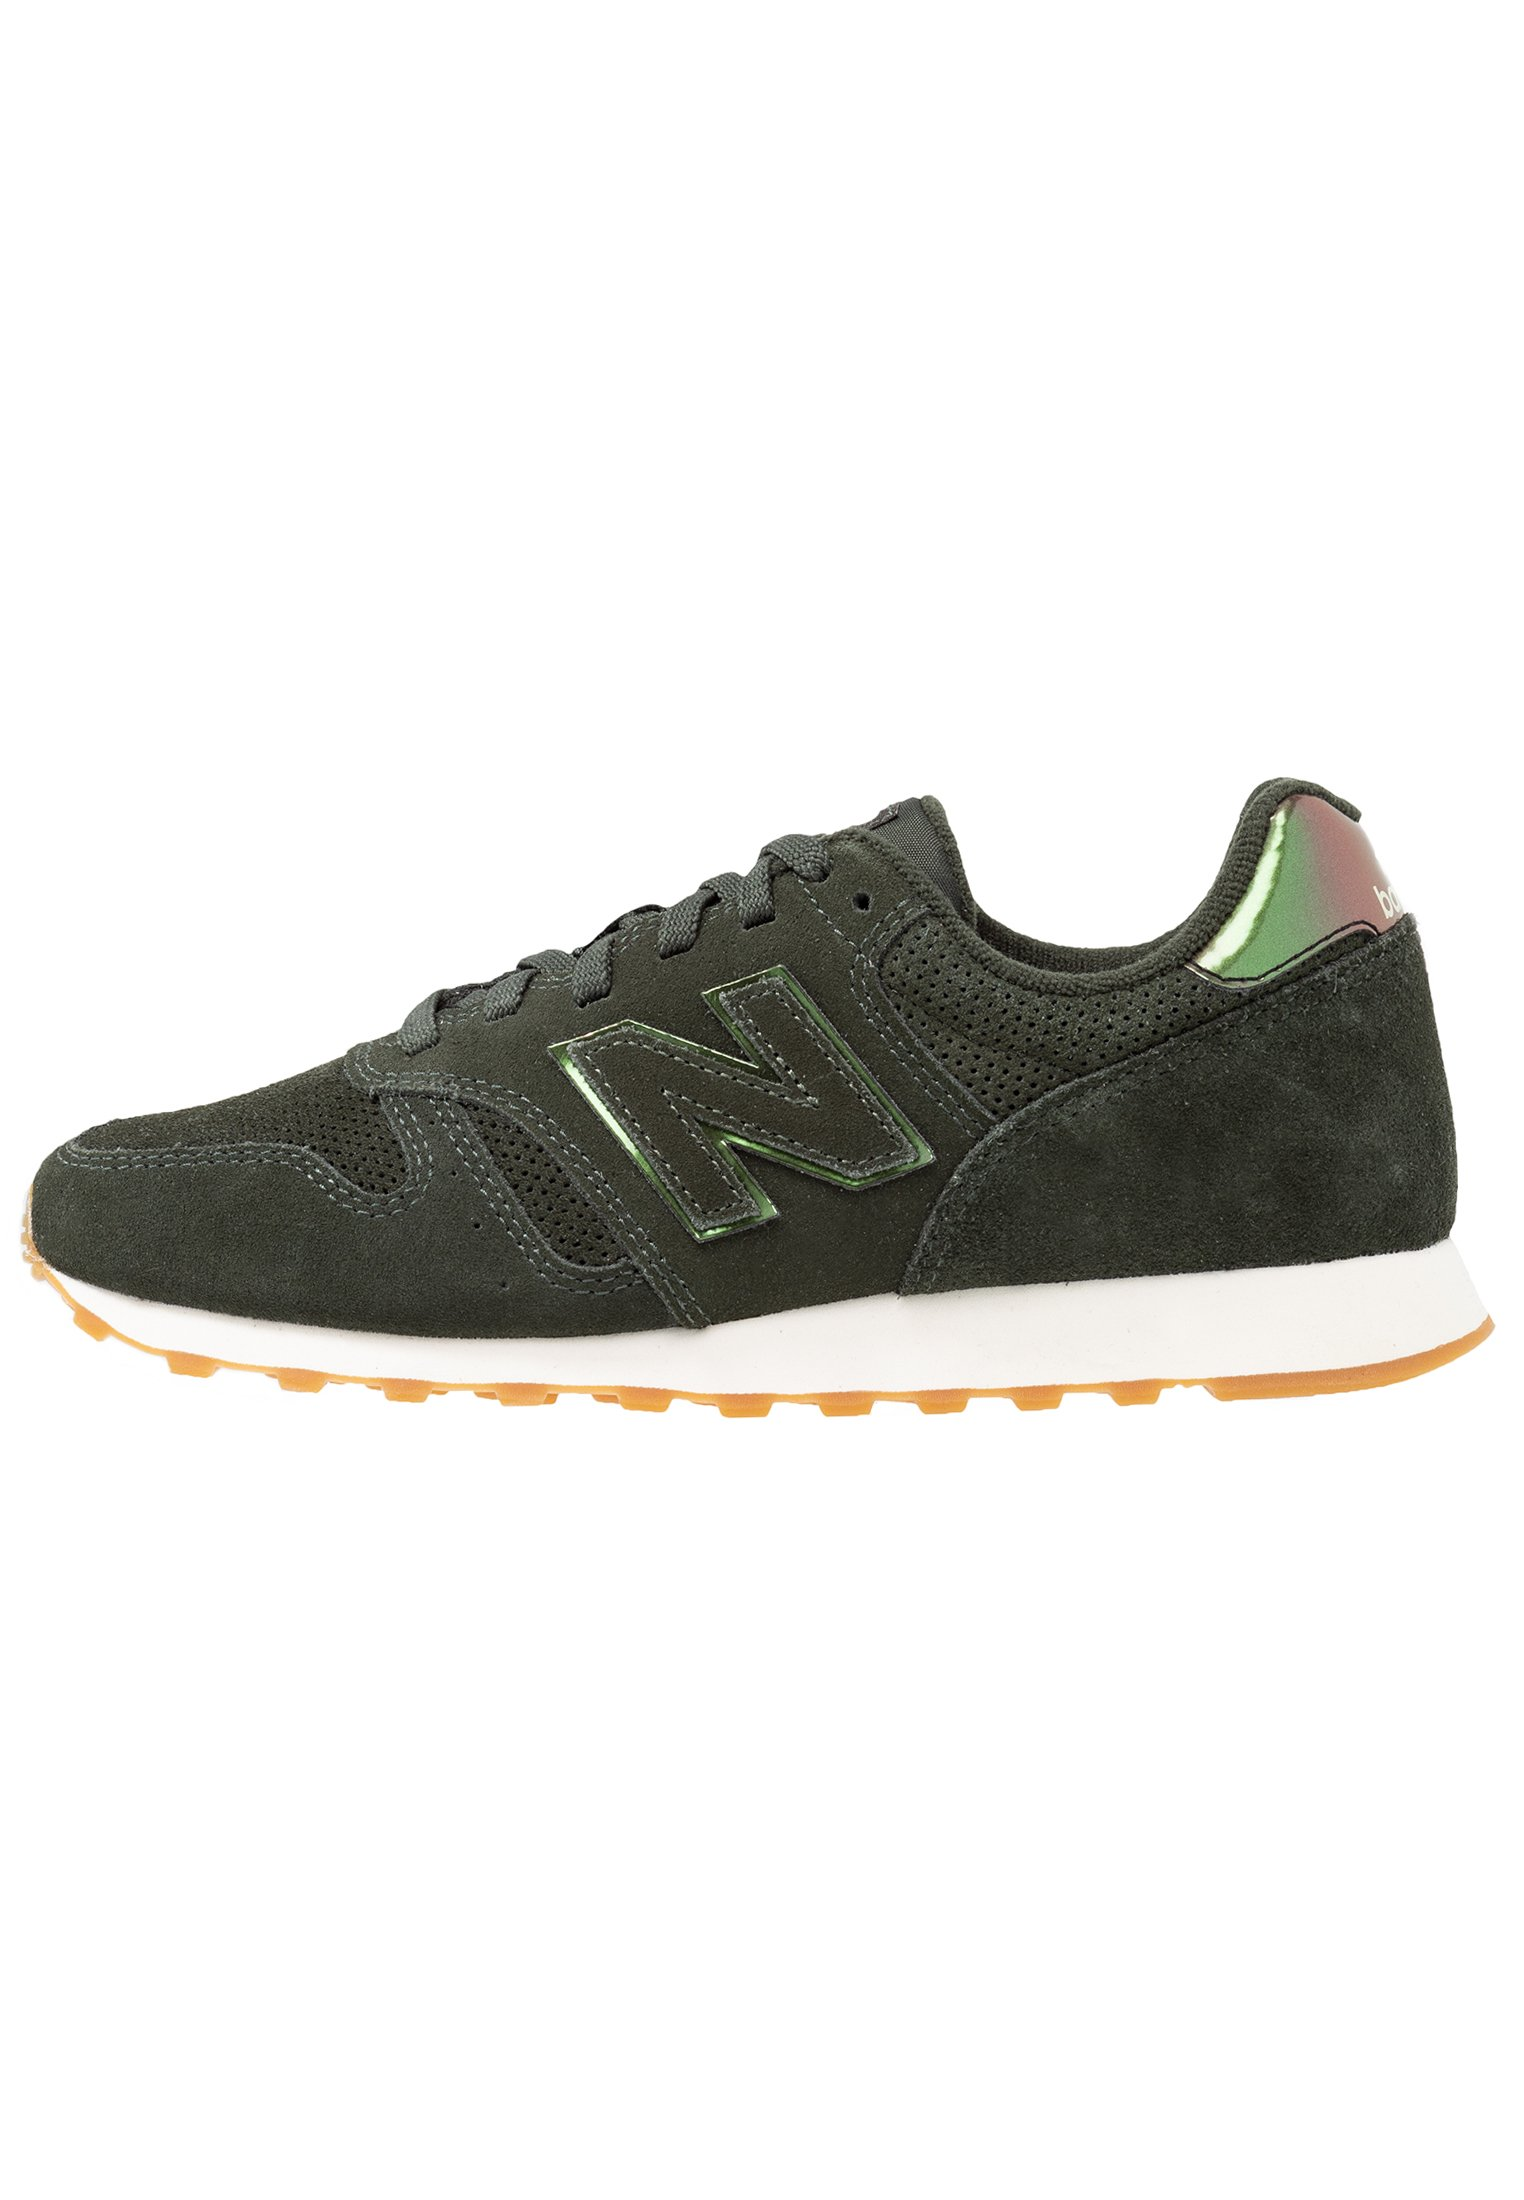 New Balance Sneakers basse - green/verde - Zalando.it